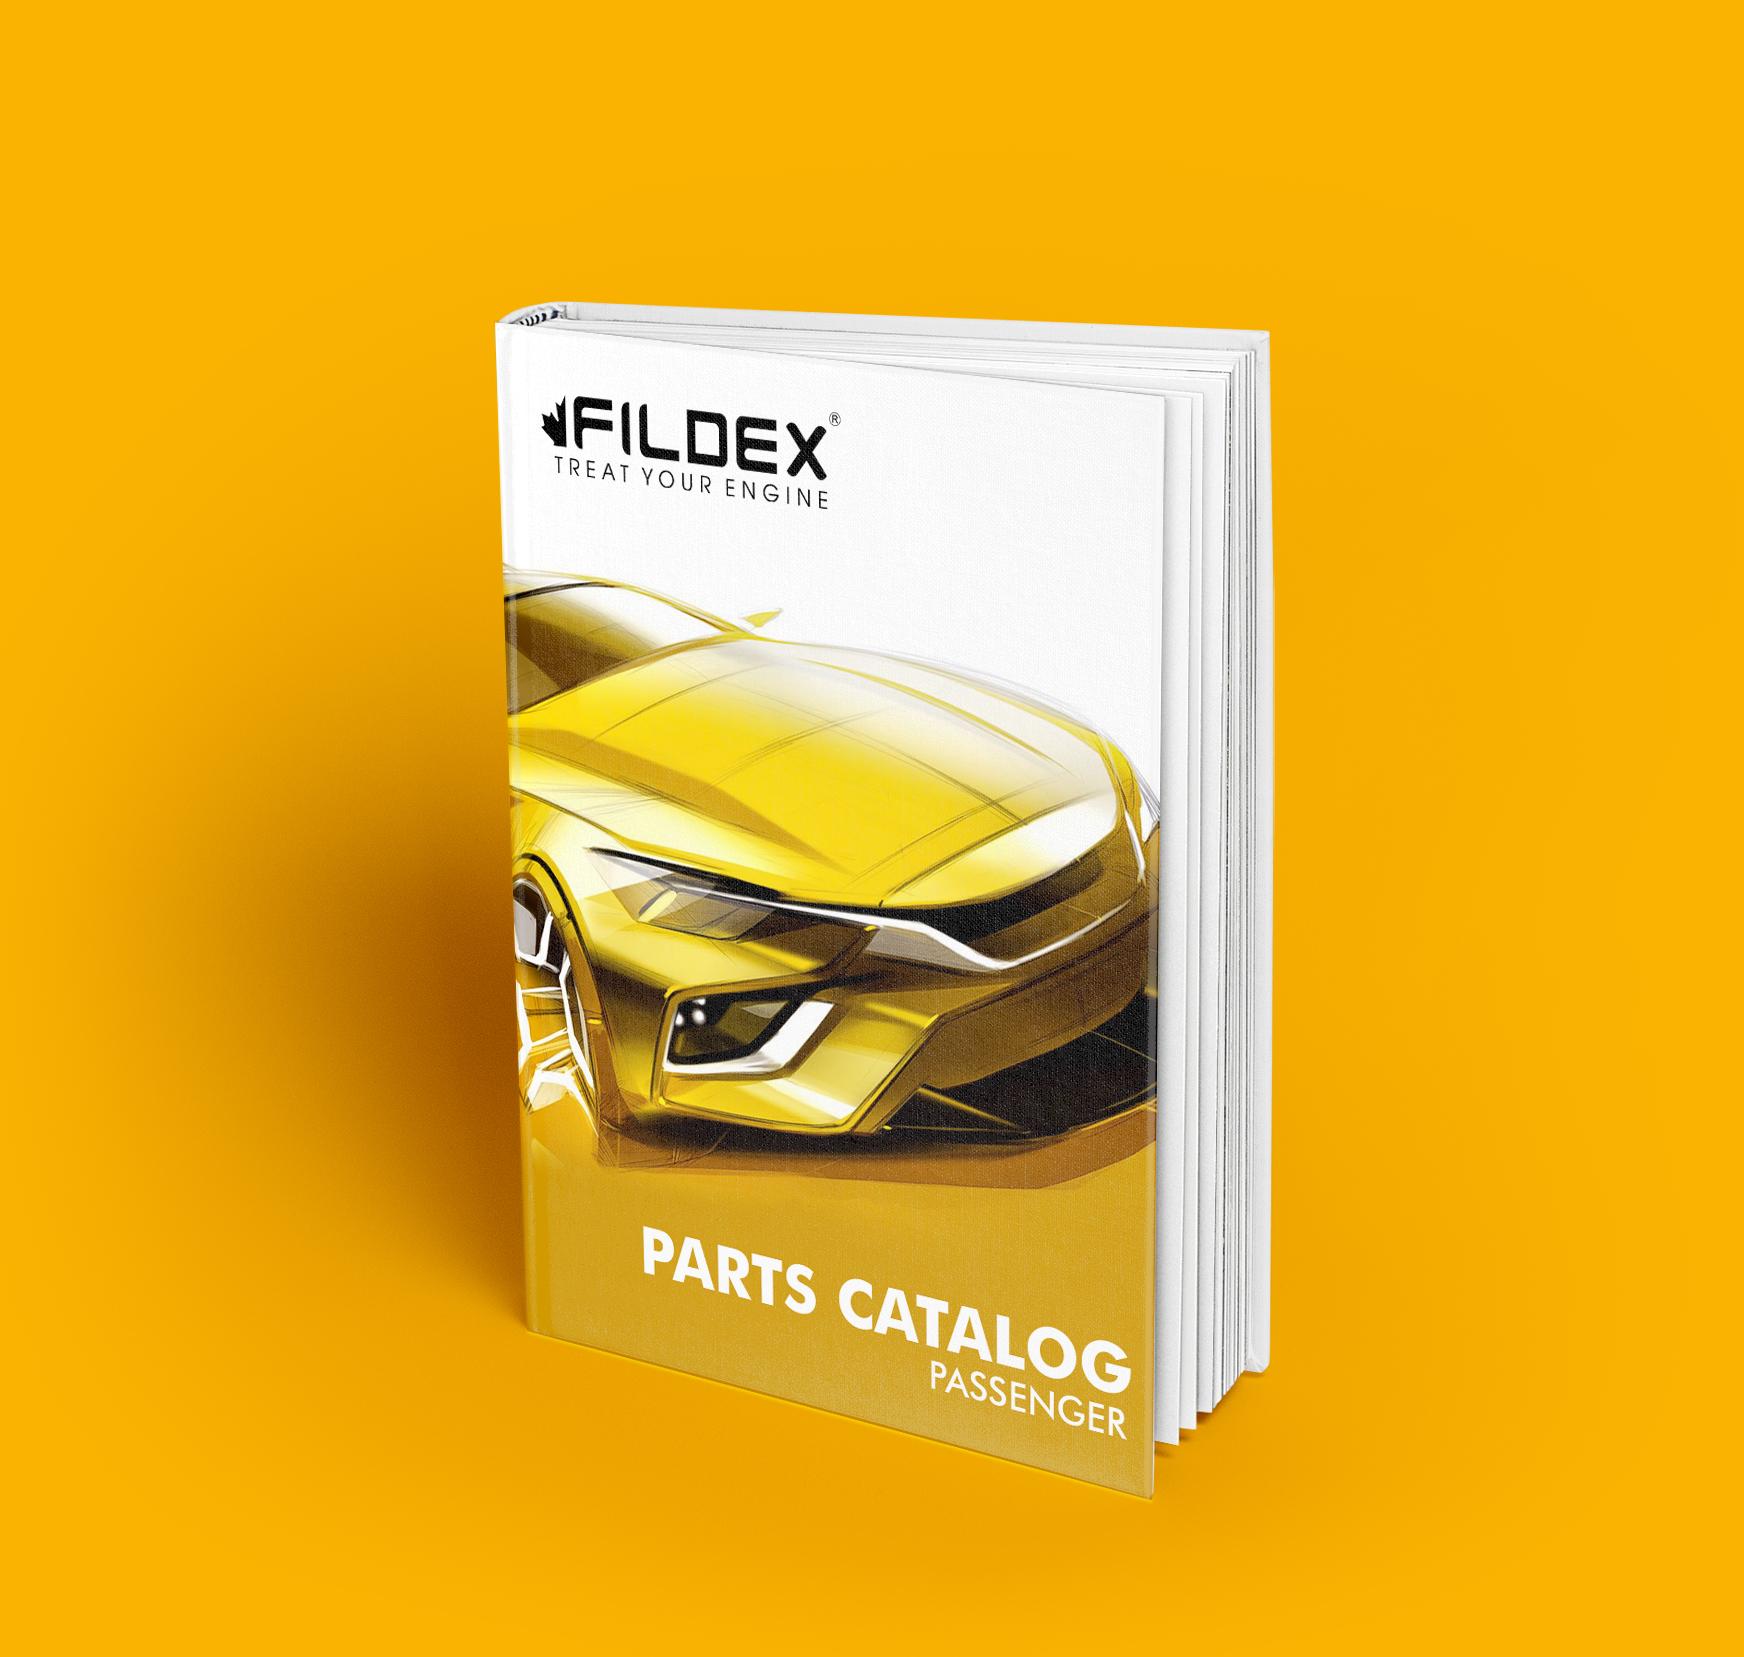 Fildex Parts Catalog - Passenger